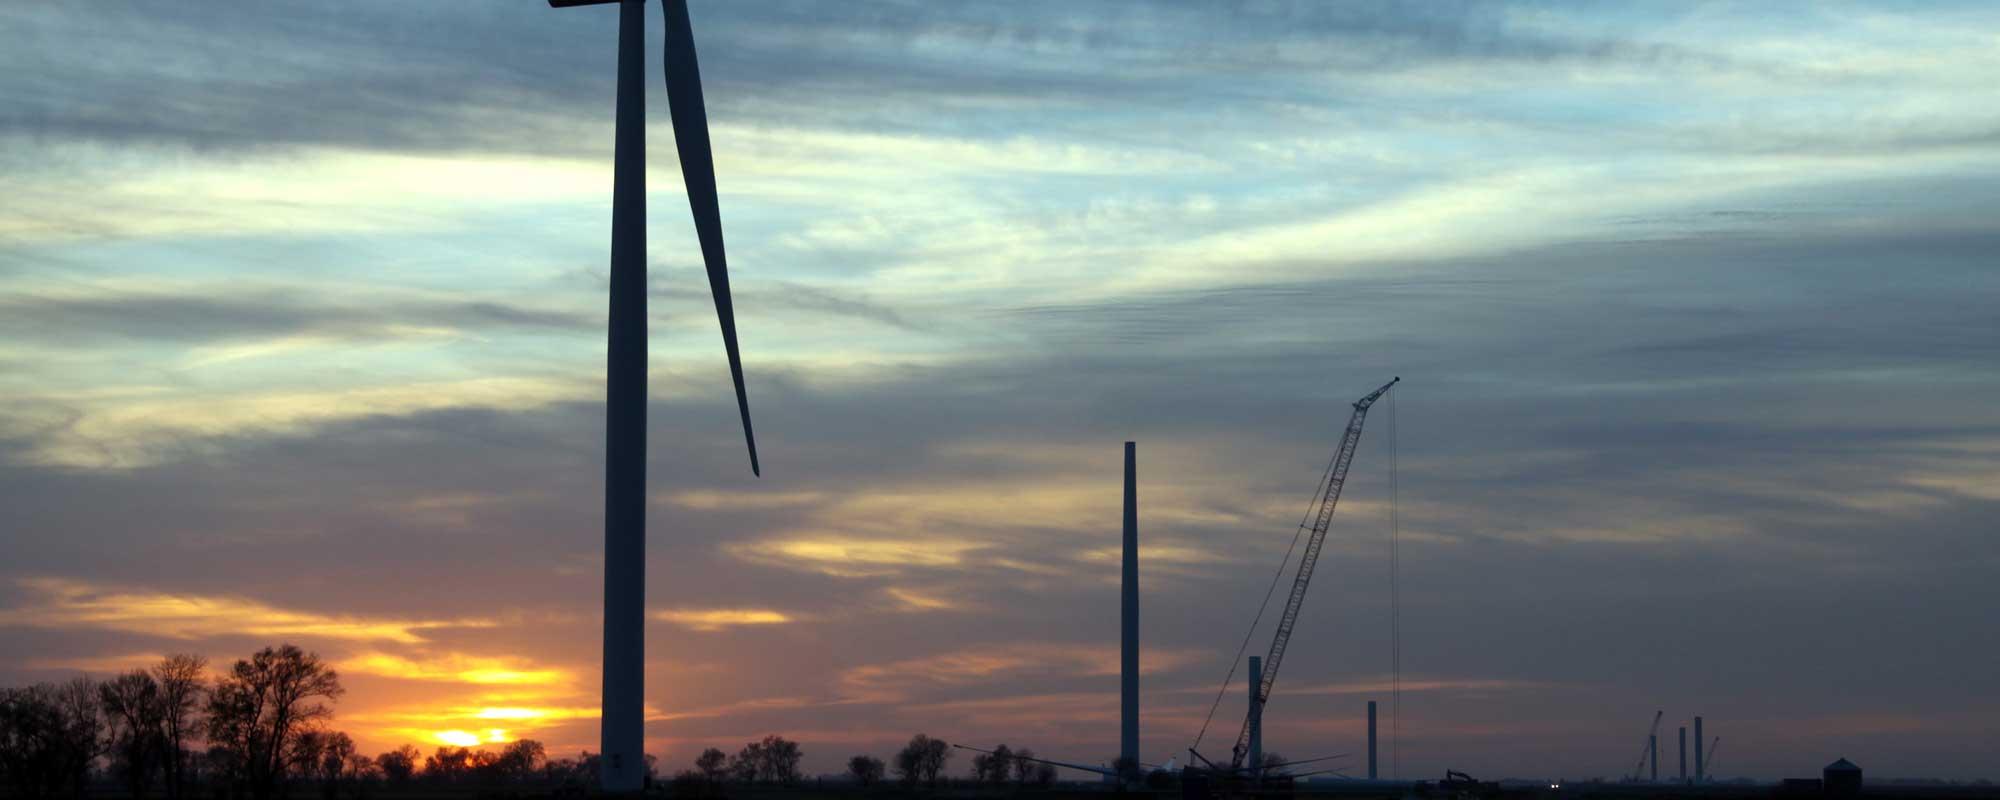 IMG-1-Turbine-landscape-2000x800